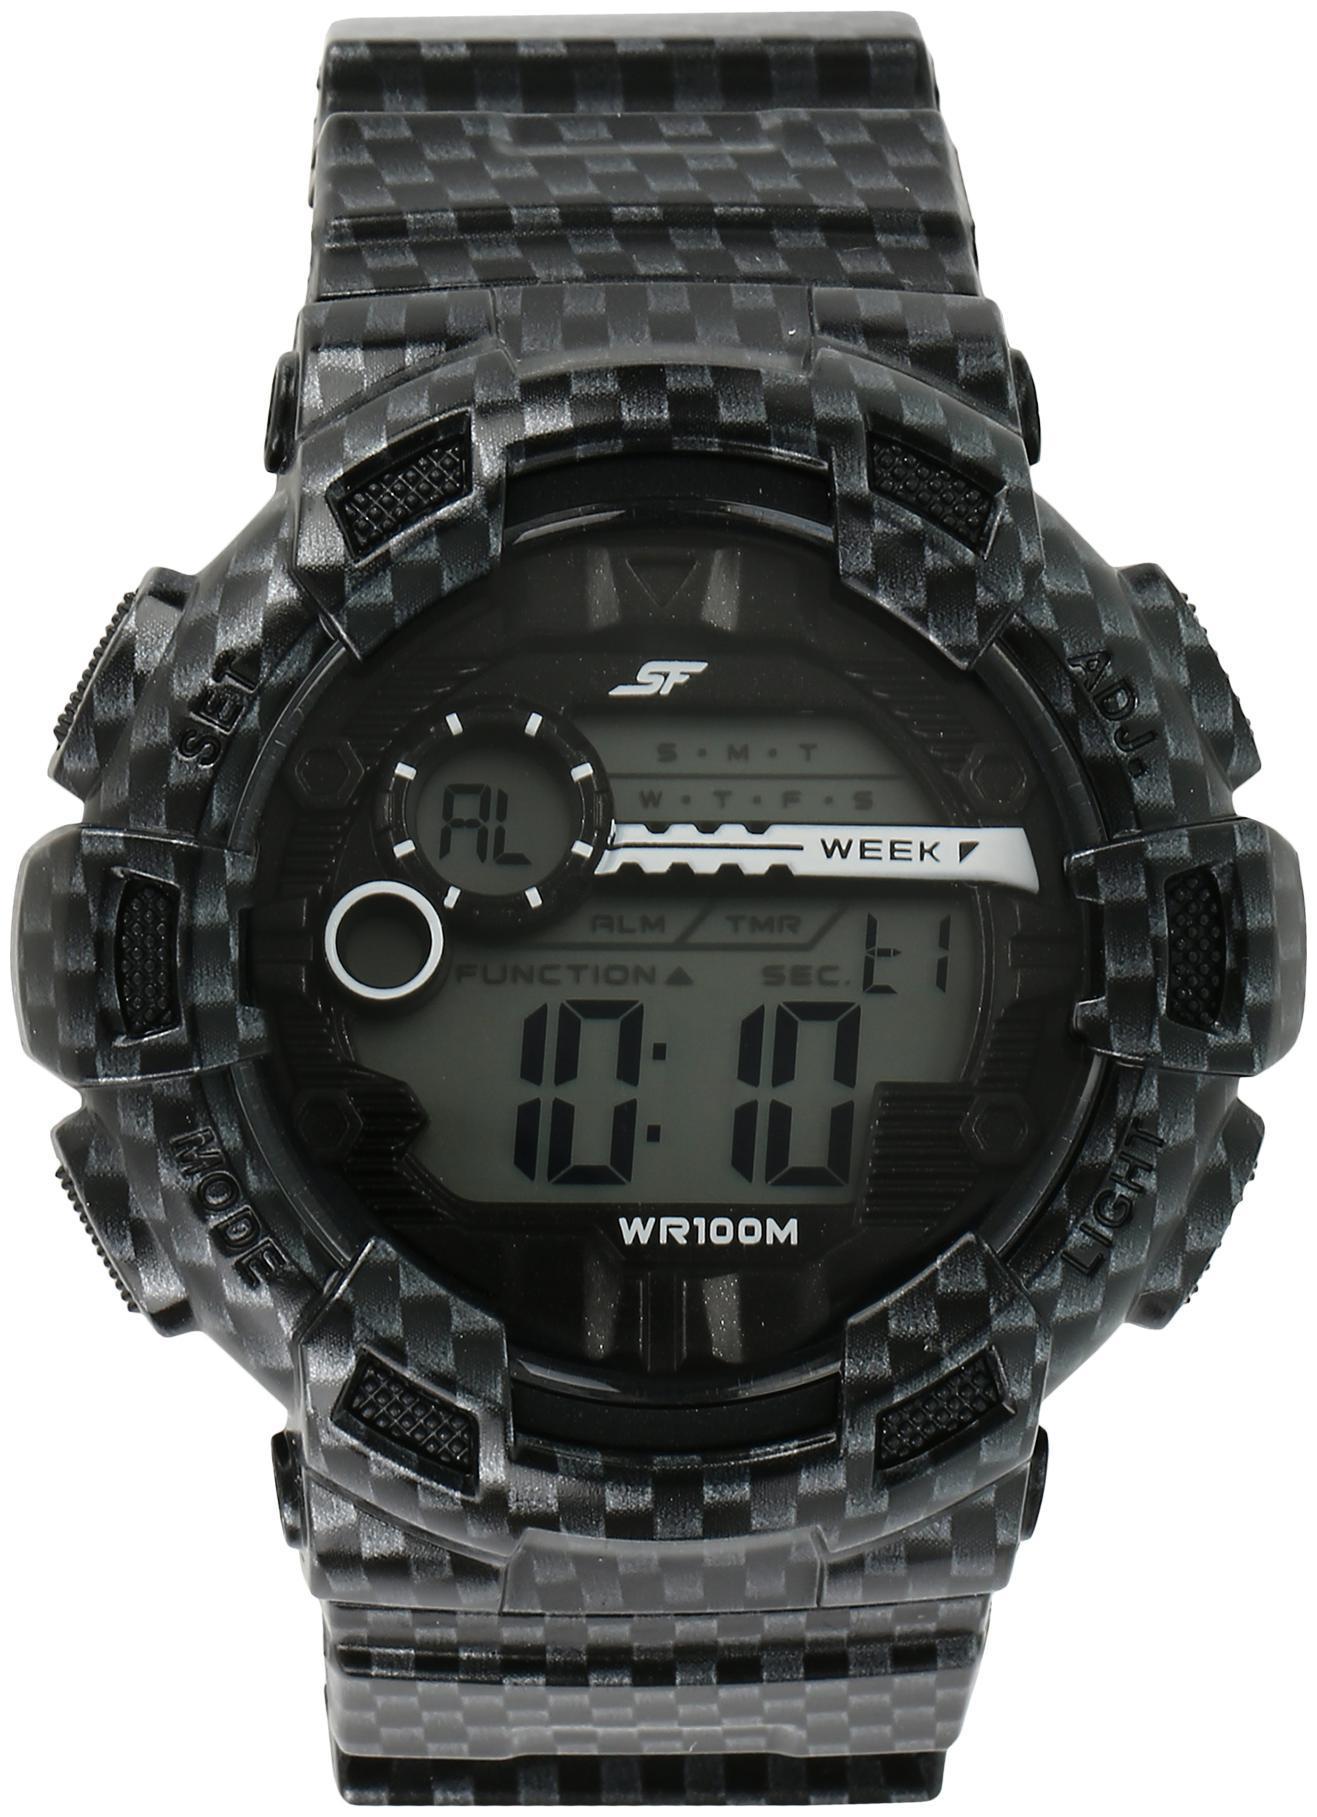 Sonata Analog digital watch for men by Titan Company